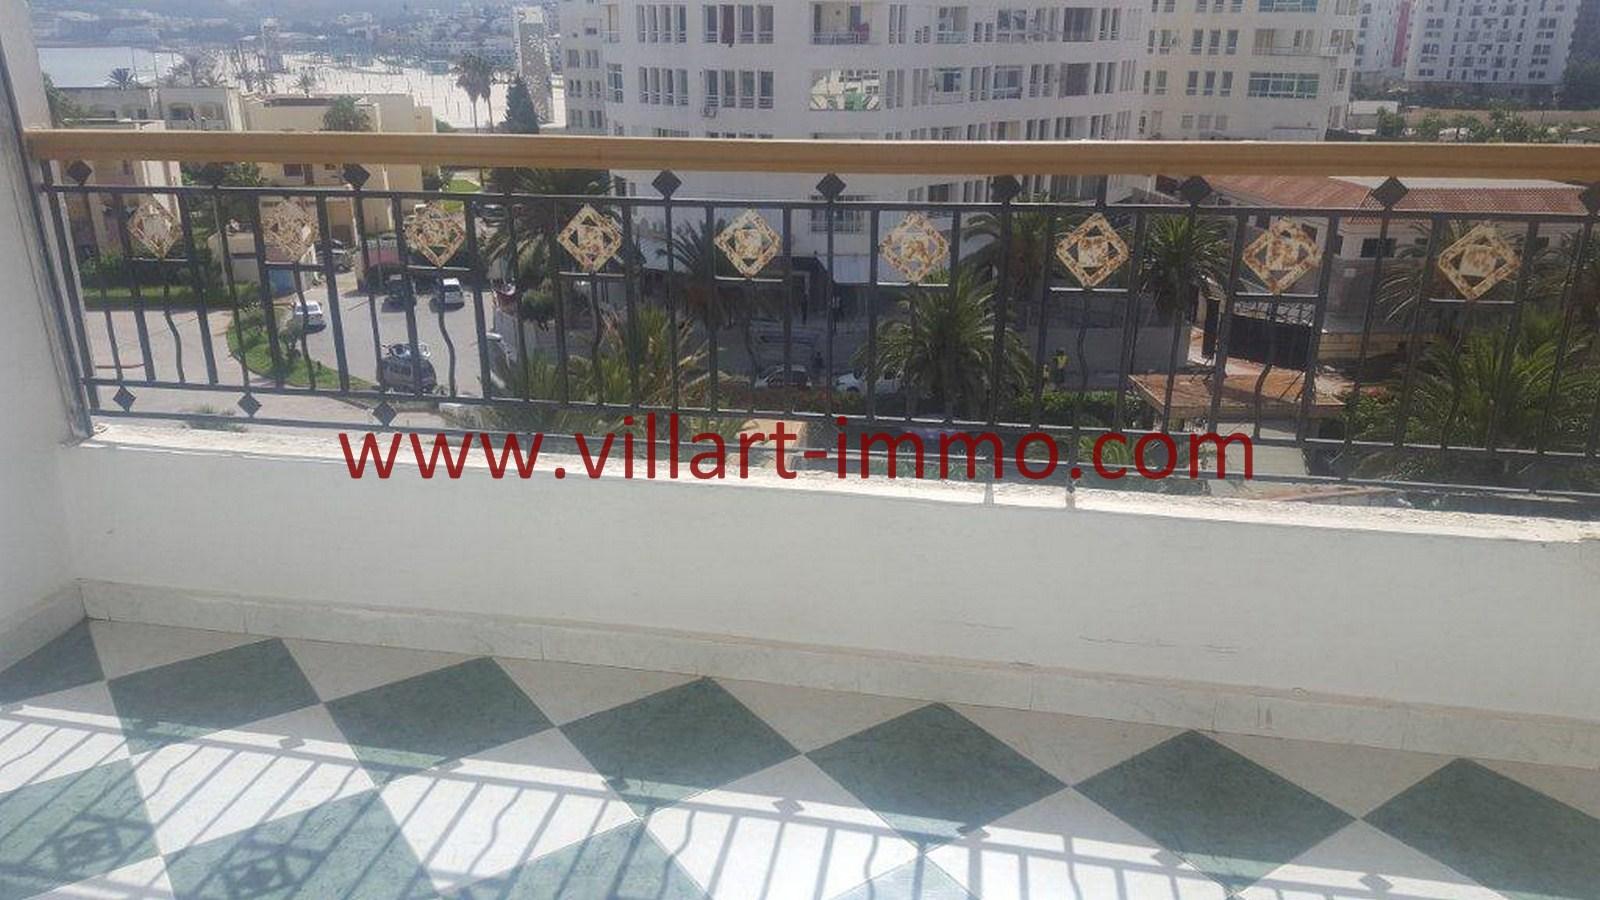 2-Vente-Appartement-Tanger-Malabata-Terrasse -VA507-Villart Immo